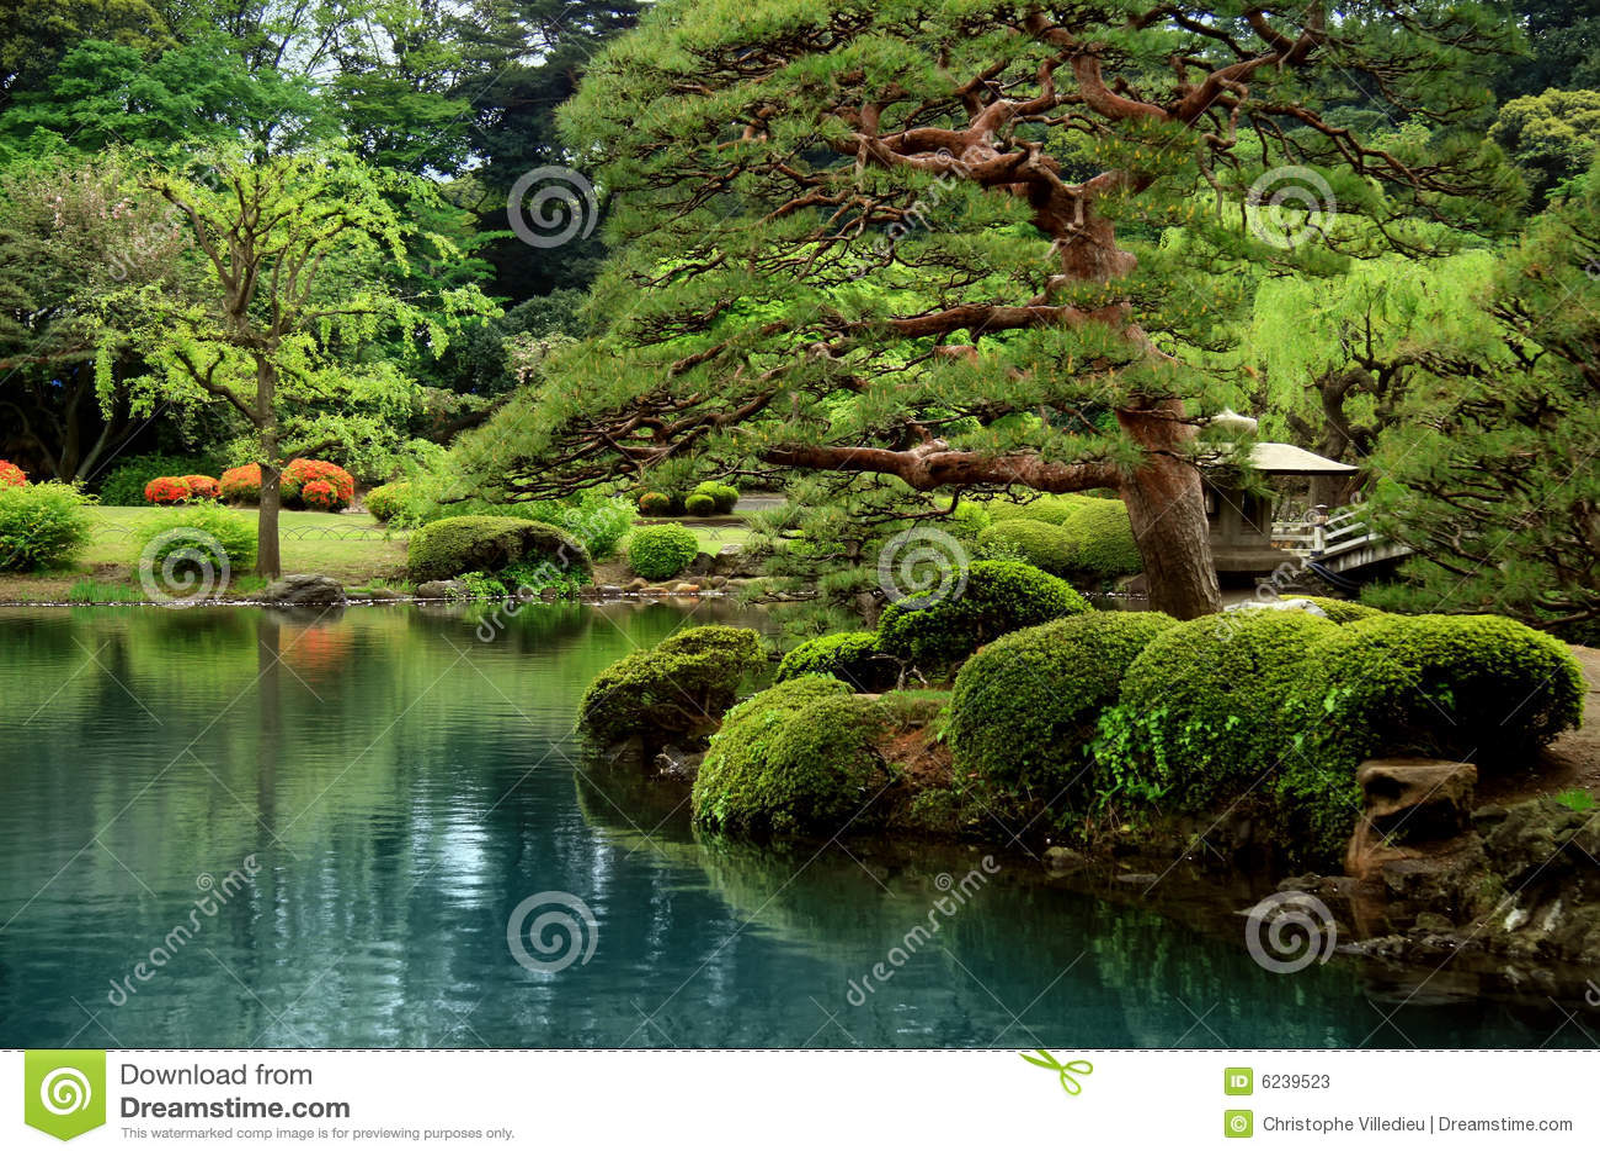 Calm Zen Lake And Bonzai Trees Stock Image  Image of